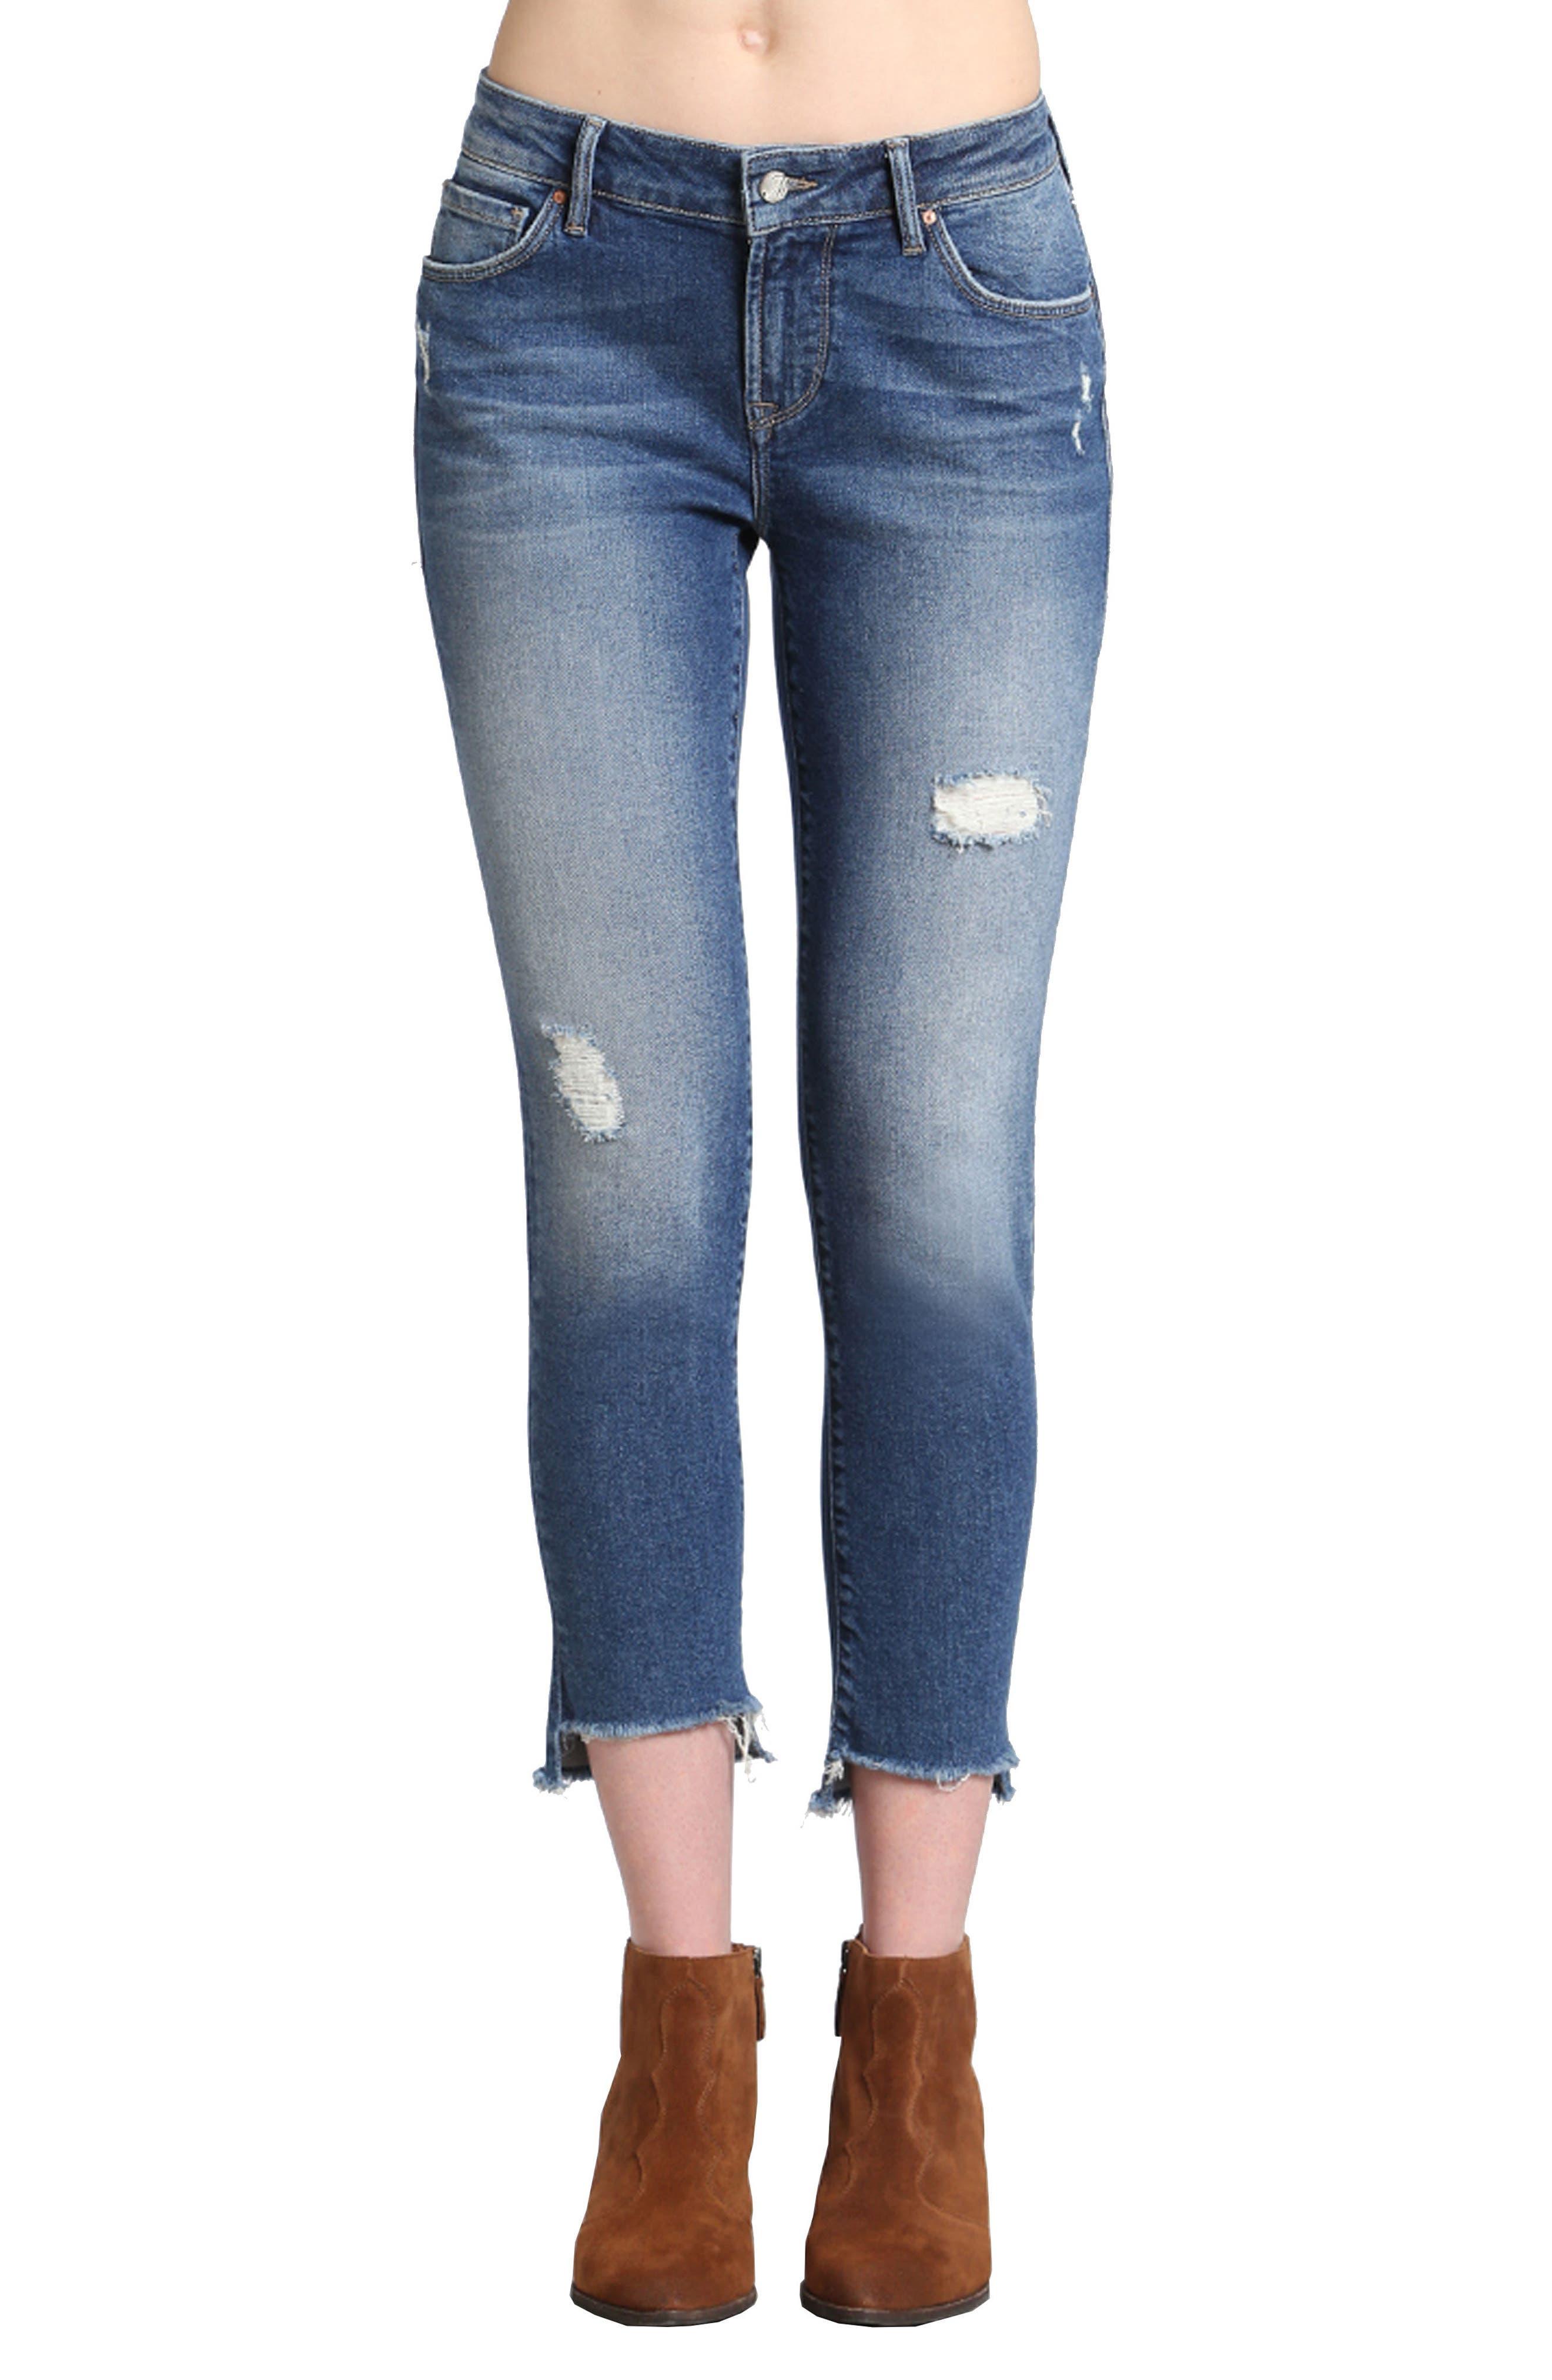 Mavi Jeans Ada Distressed Boyfriend Jeans (Mid 90s Vintage)